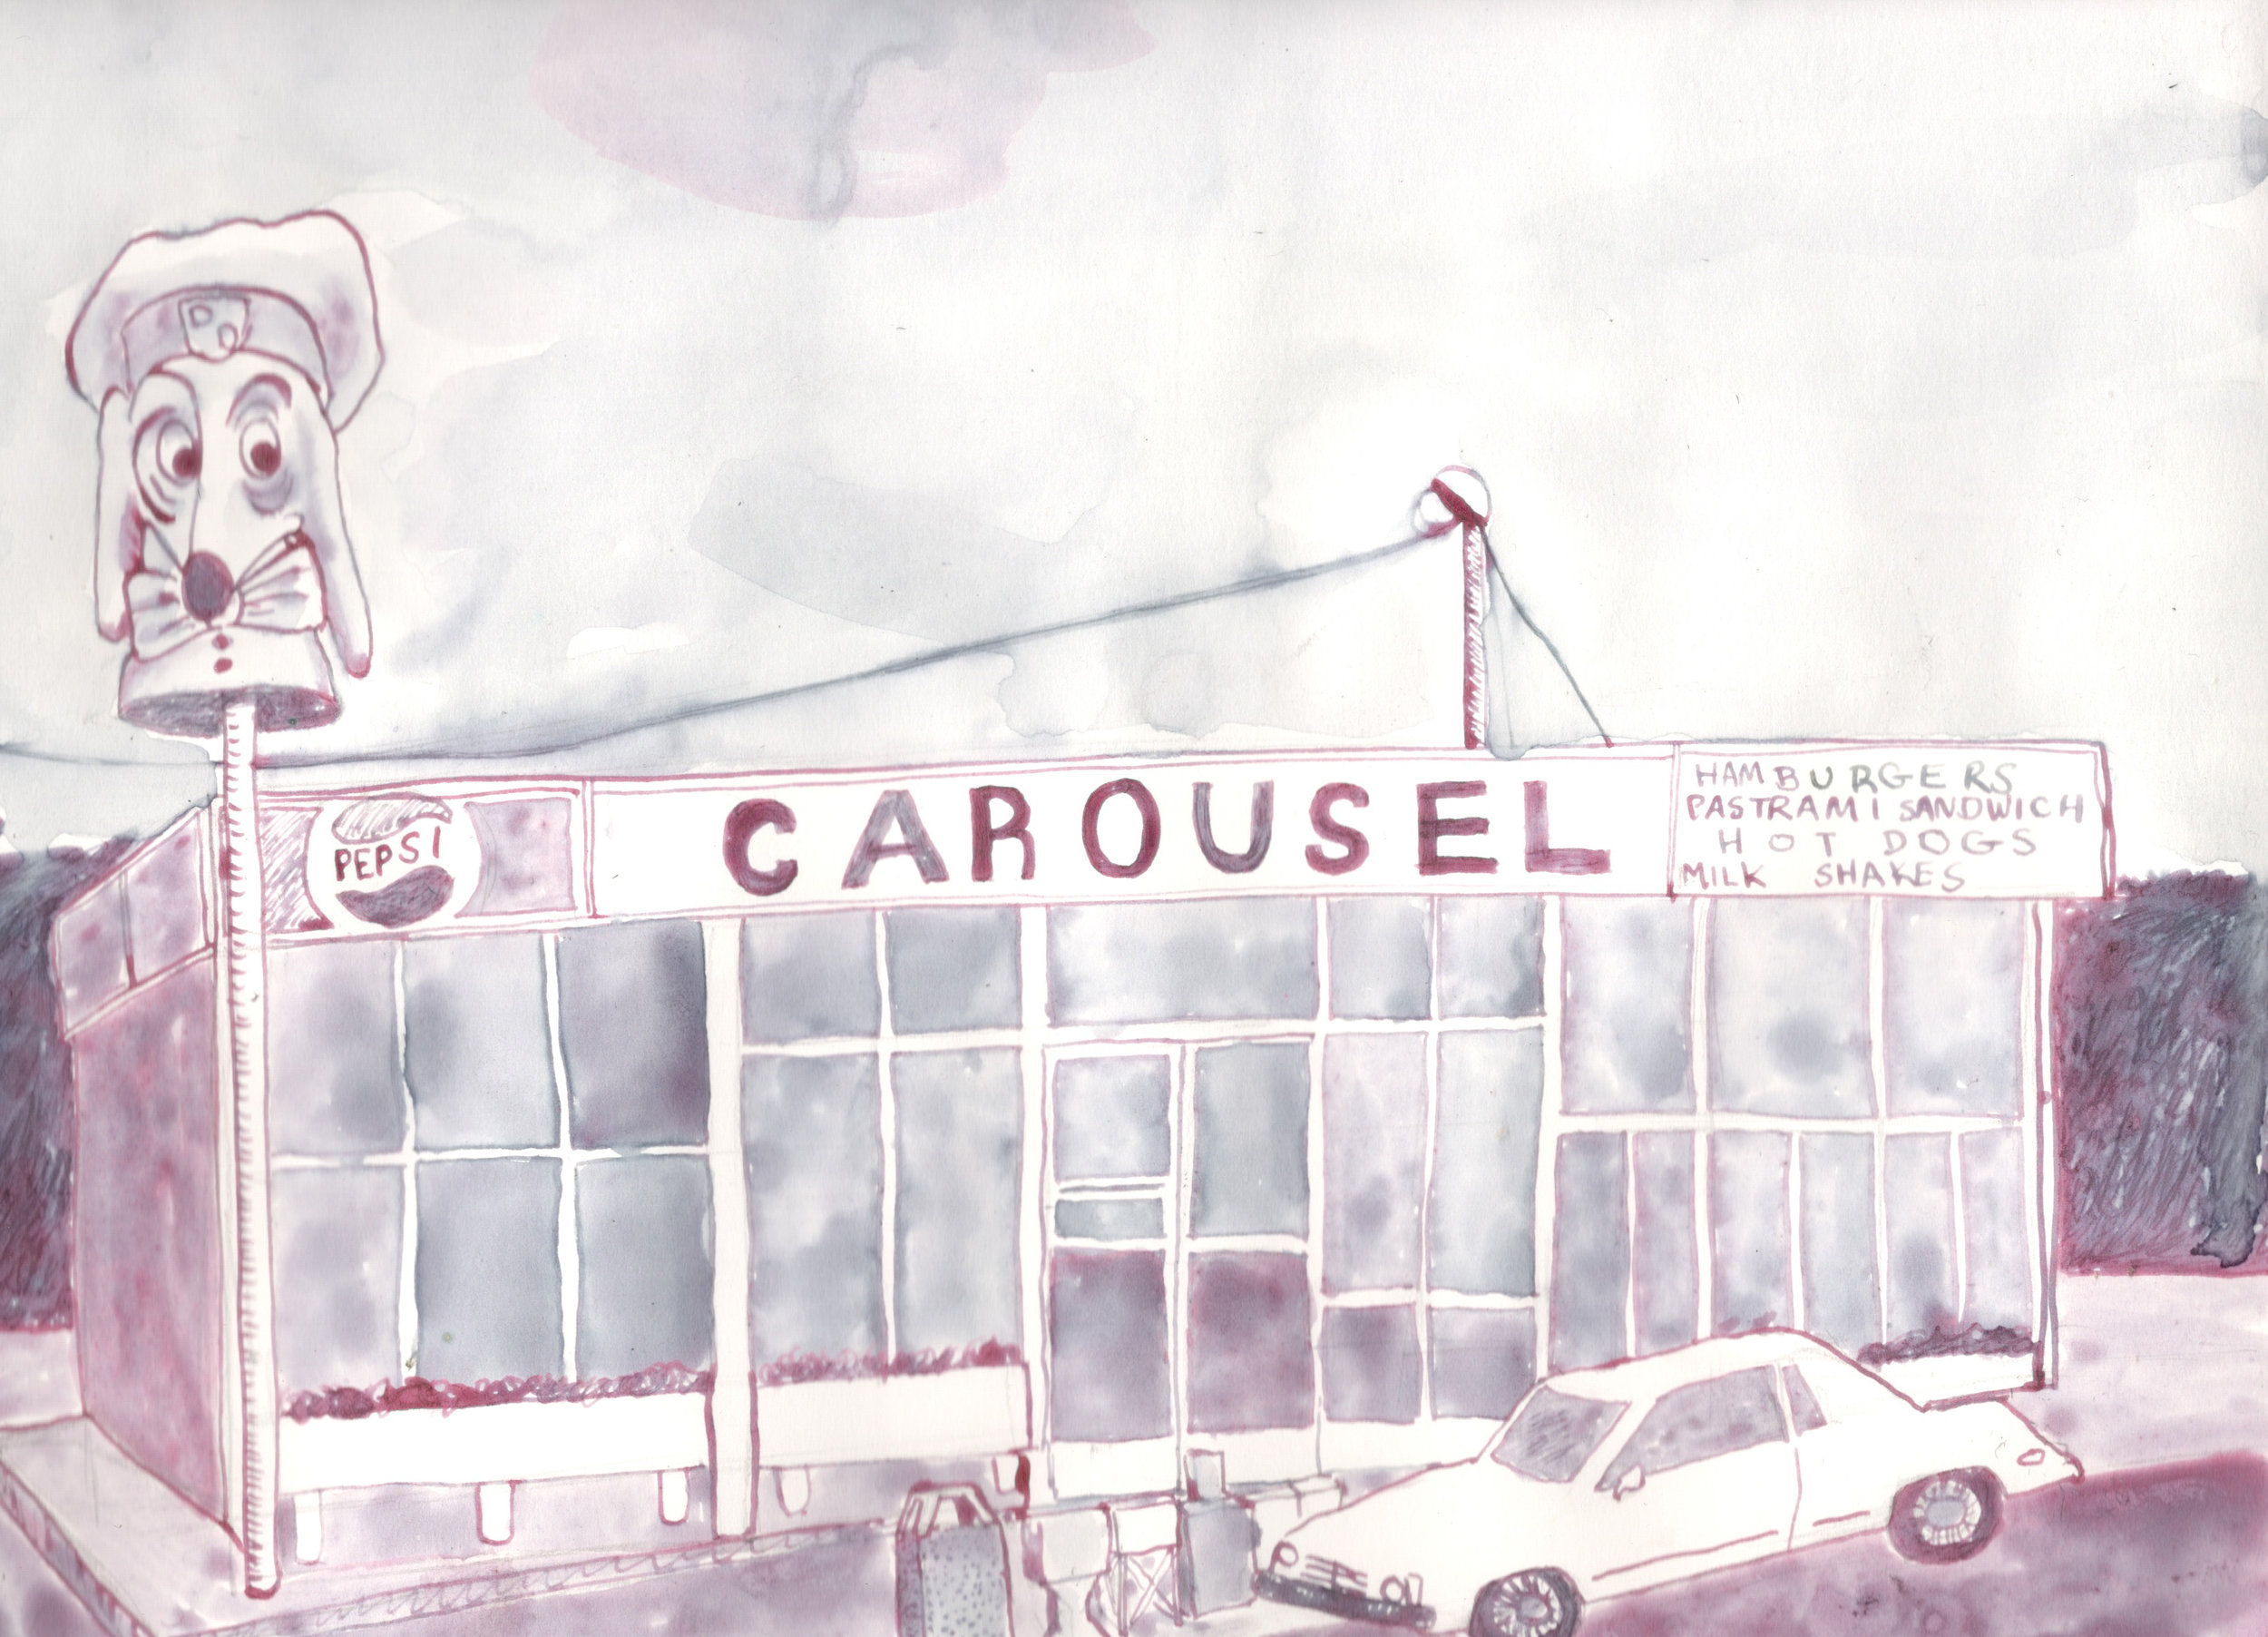 Carousel Restaurant (Doggie Diner), 1974